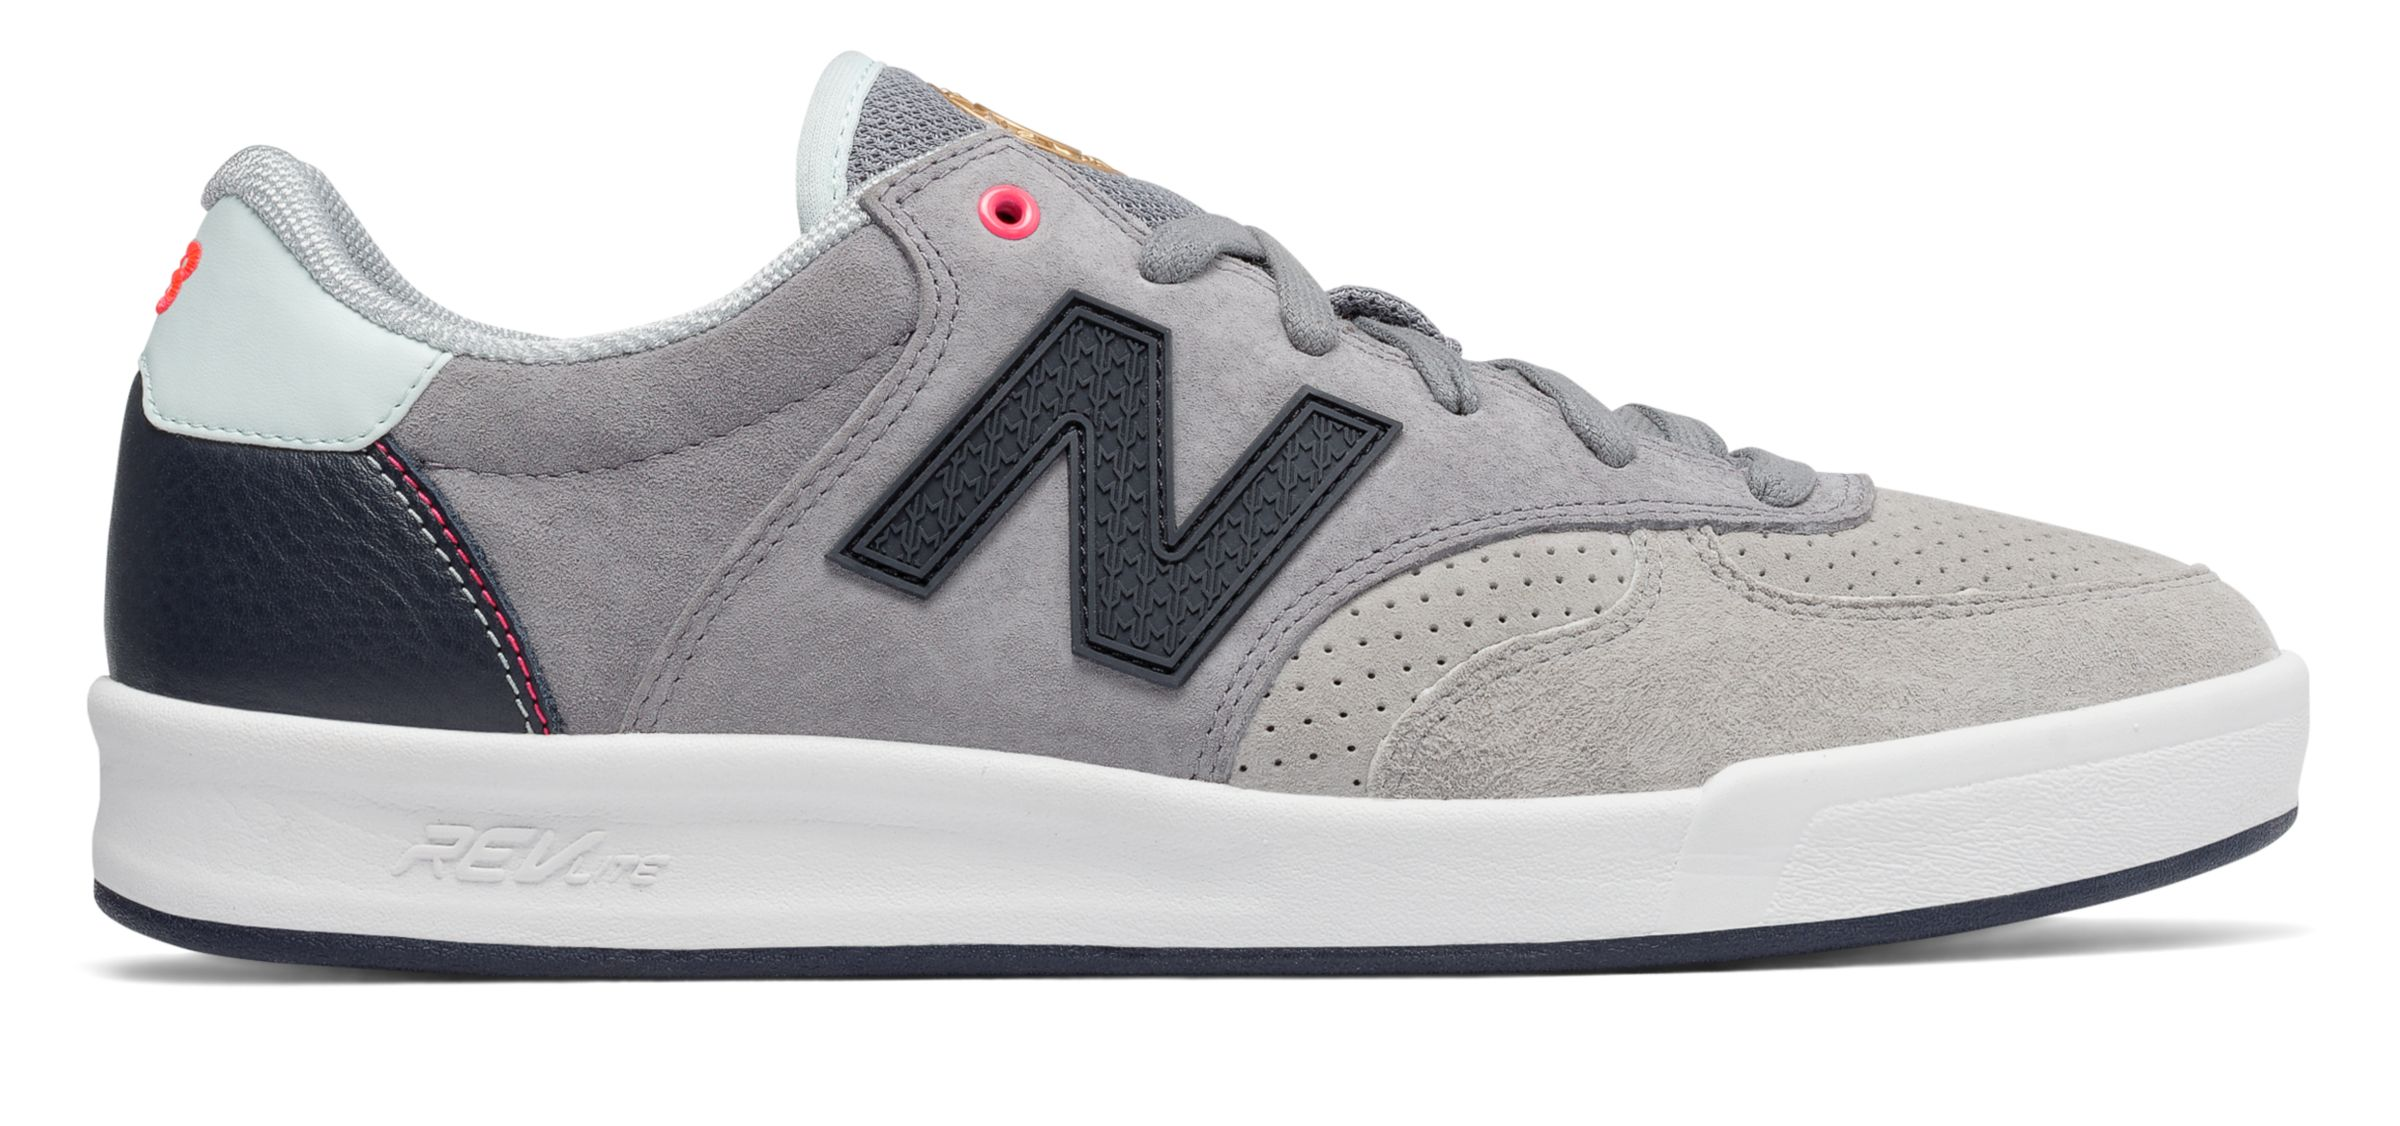 New Balance : 300 Tournament Suede : Men's Footwear Outlet : CRT300GU